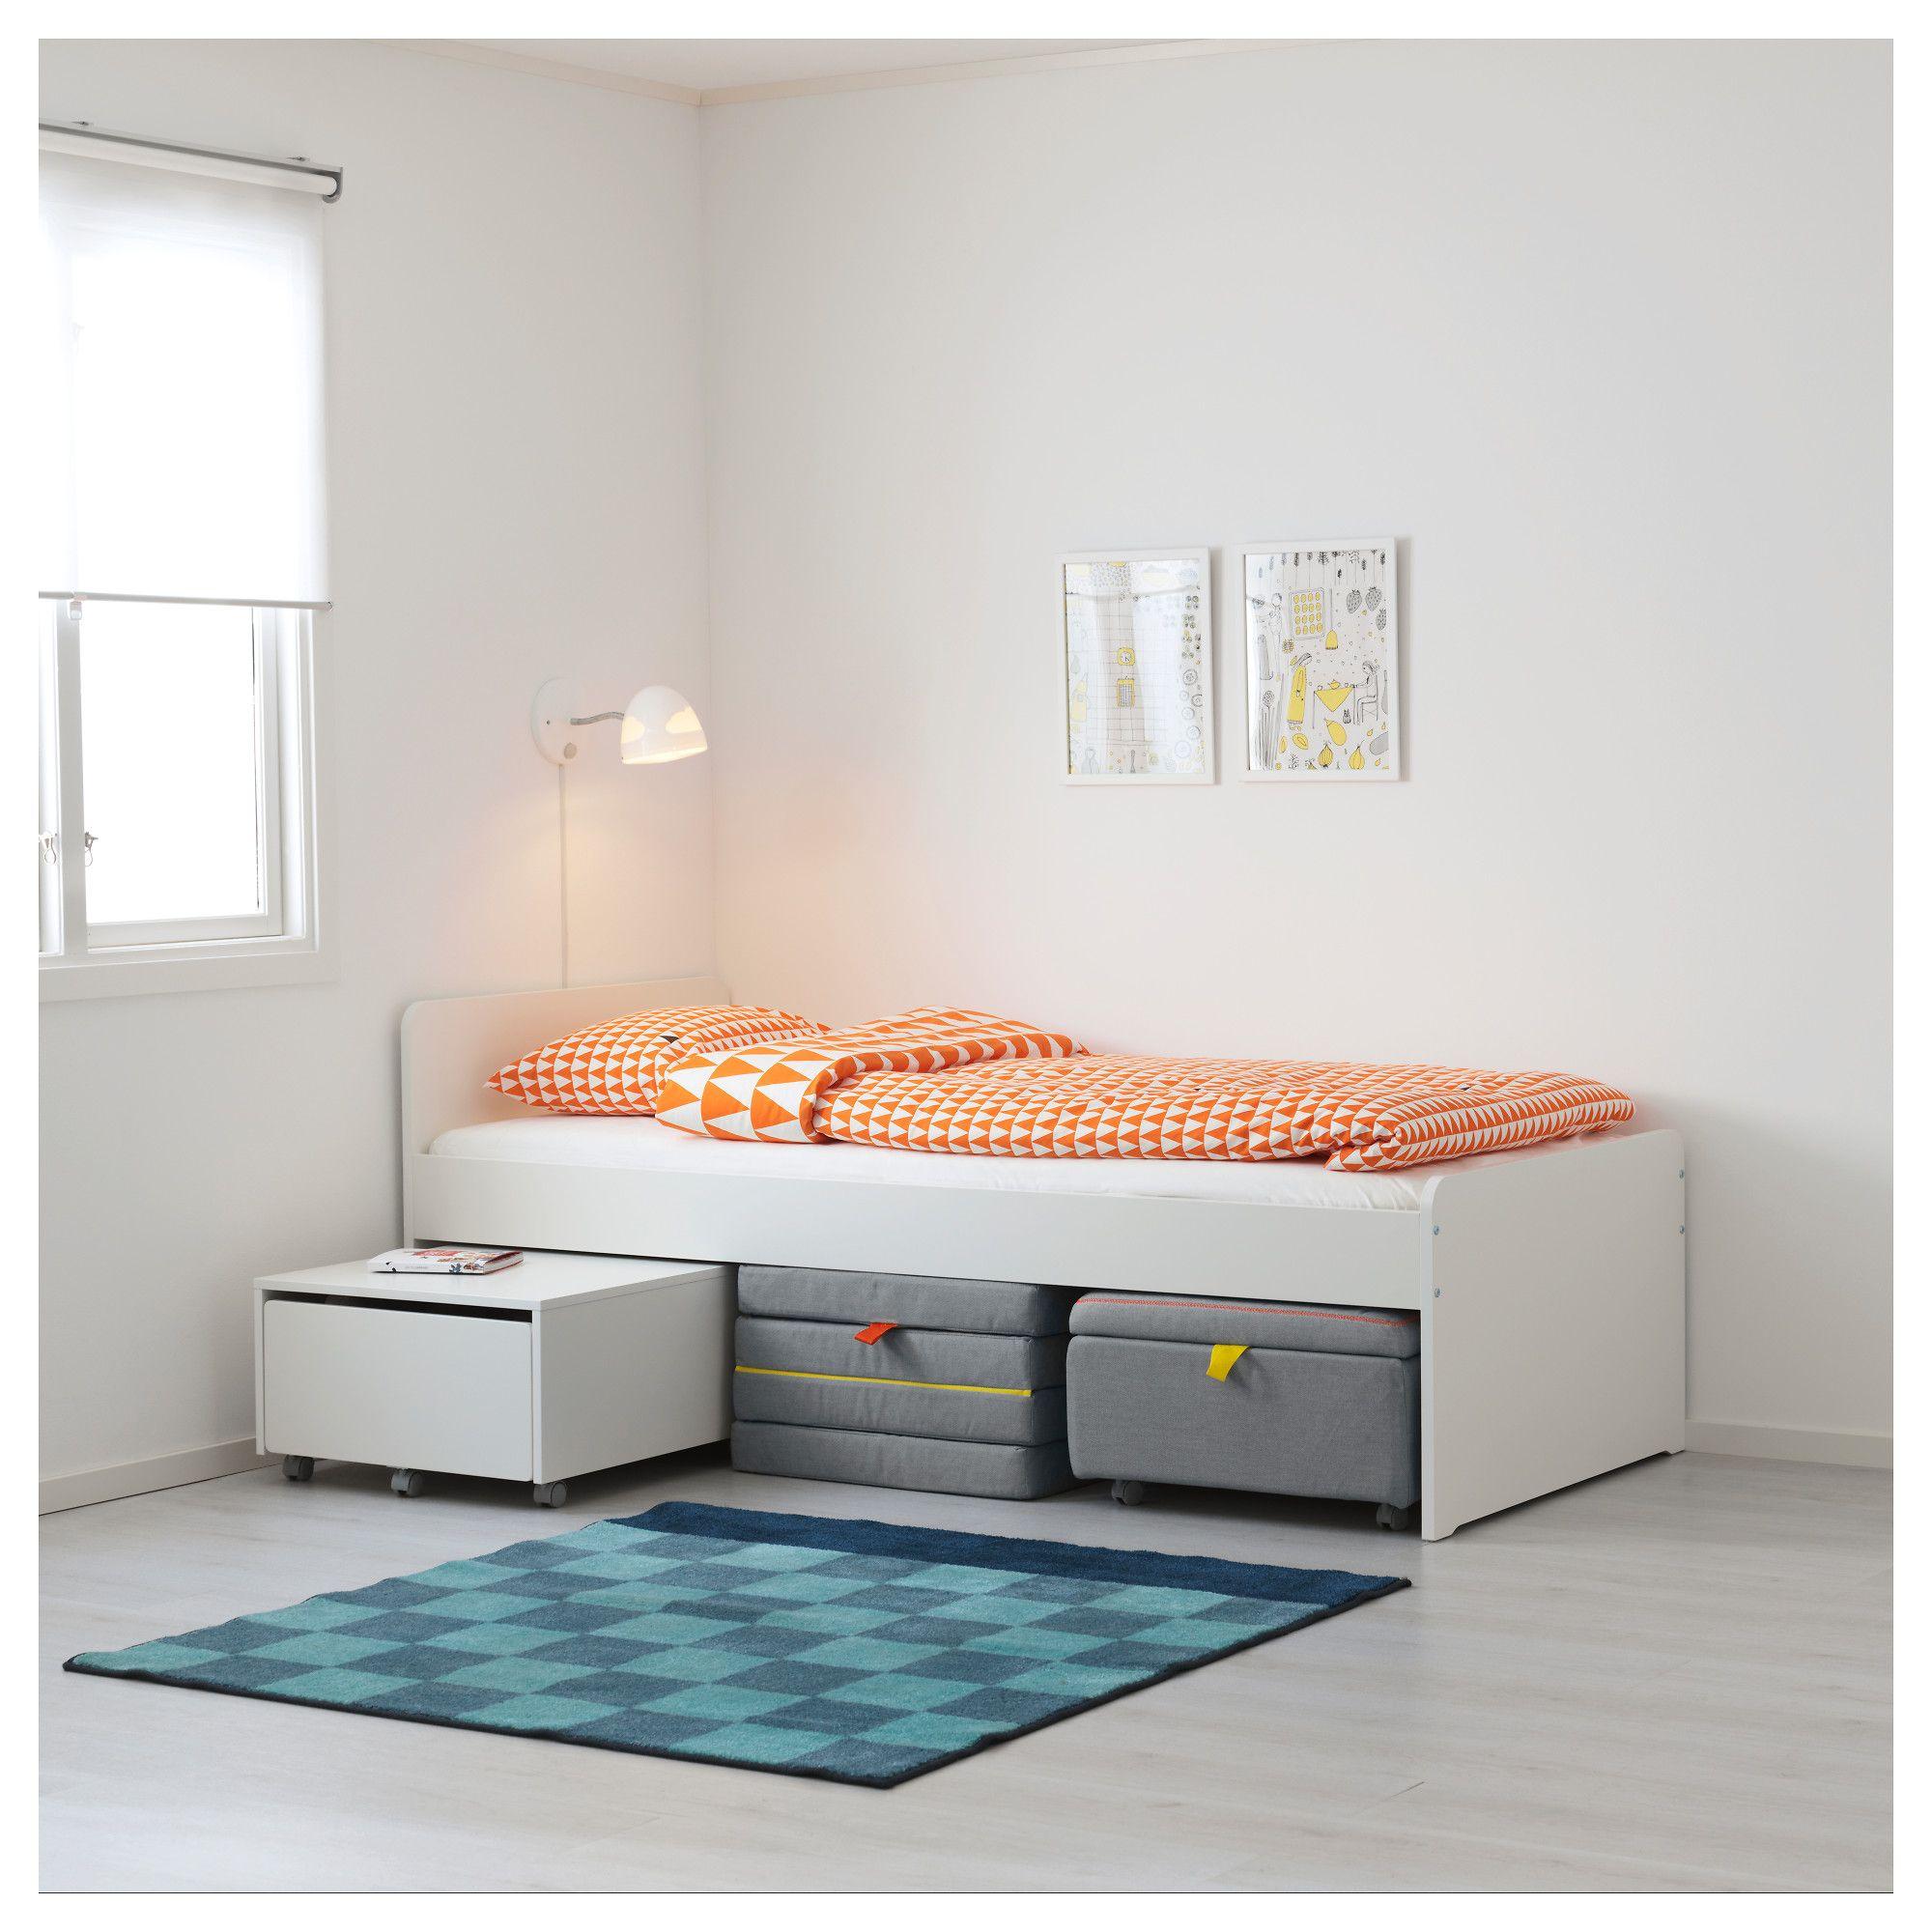 IKEA SLÄKT Mattress, folding Bed frame with storage